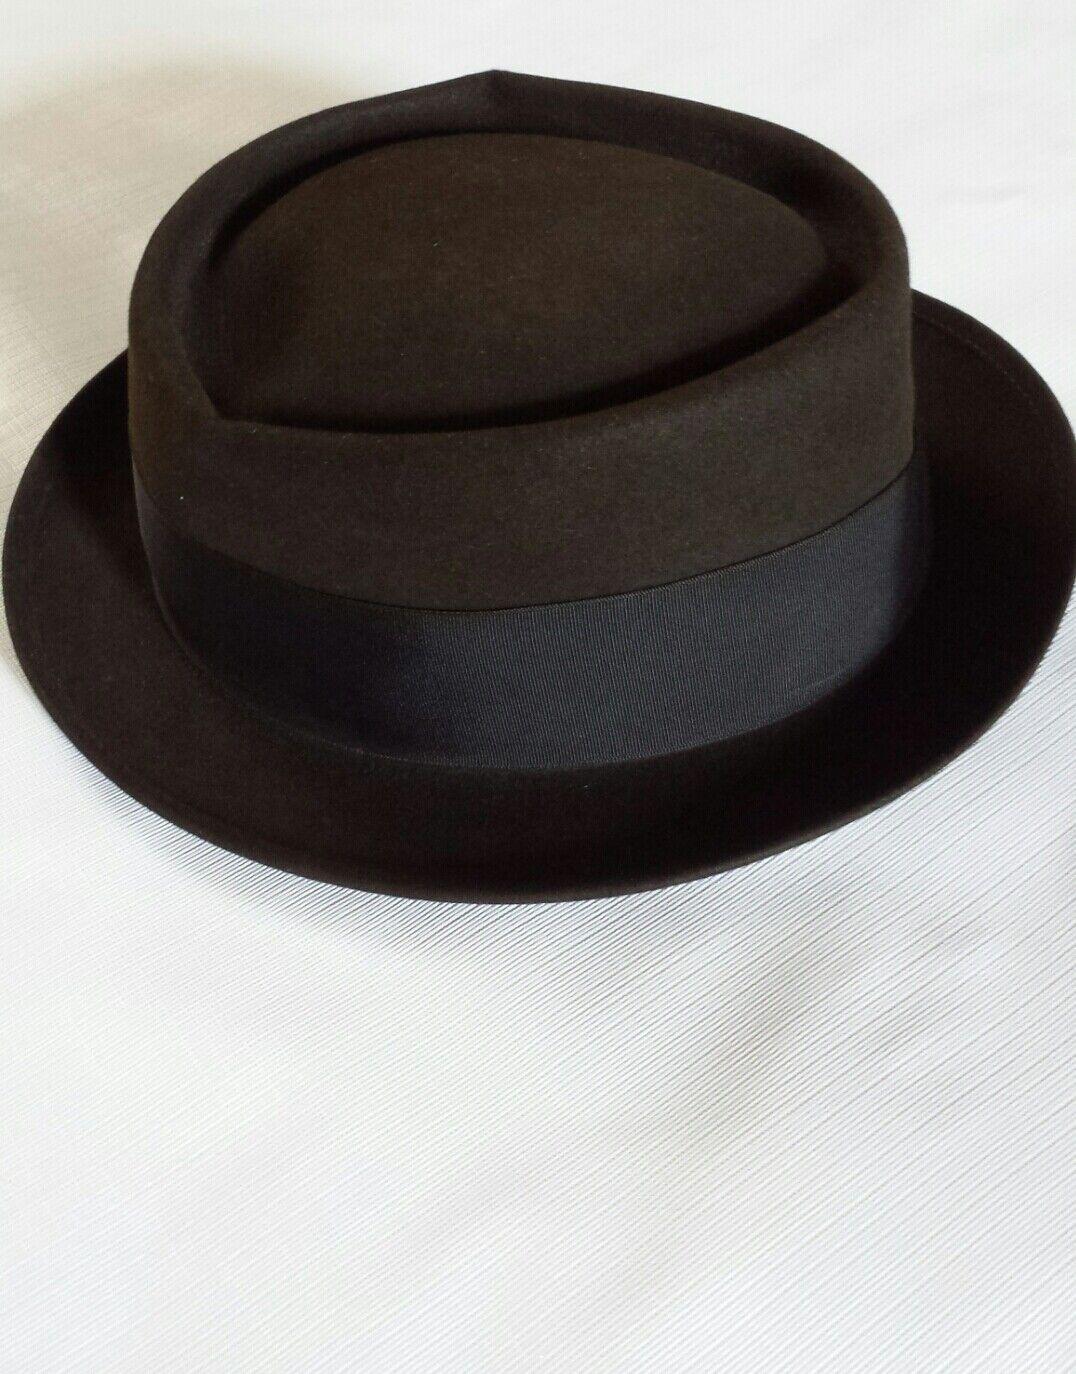 Vintage Mallory Pork Pie Style Felt Hat Size 7 1/8 - image 4